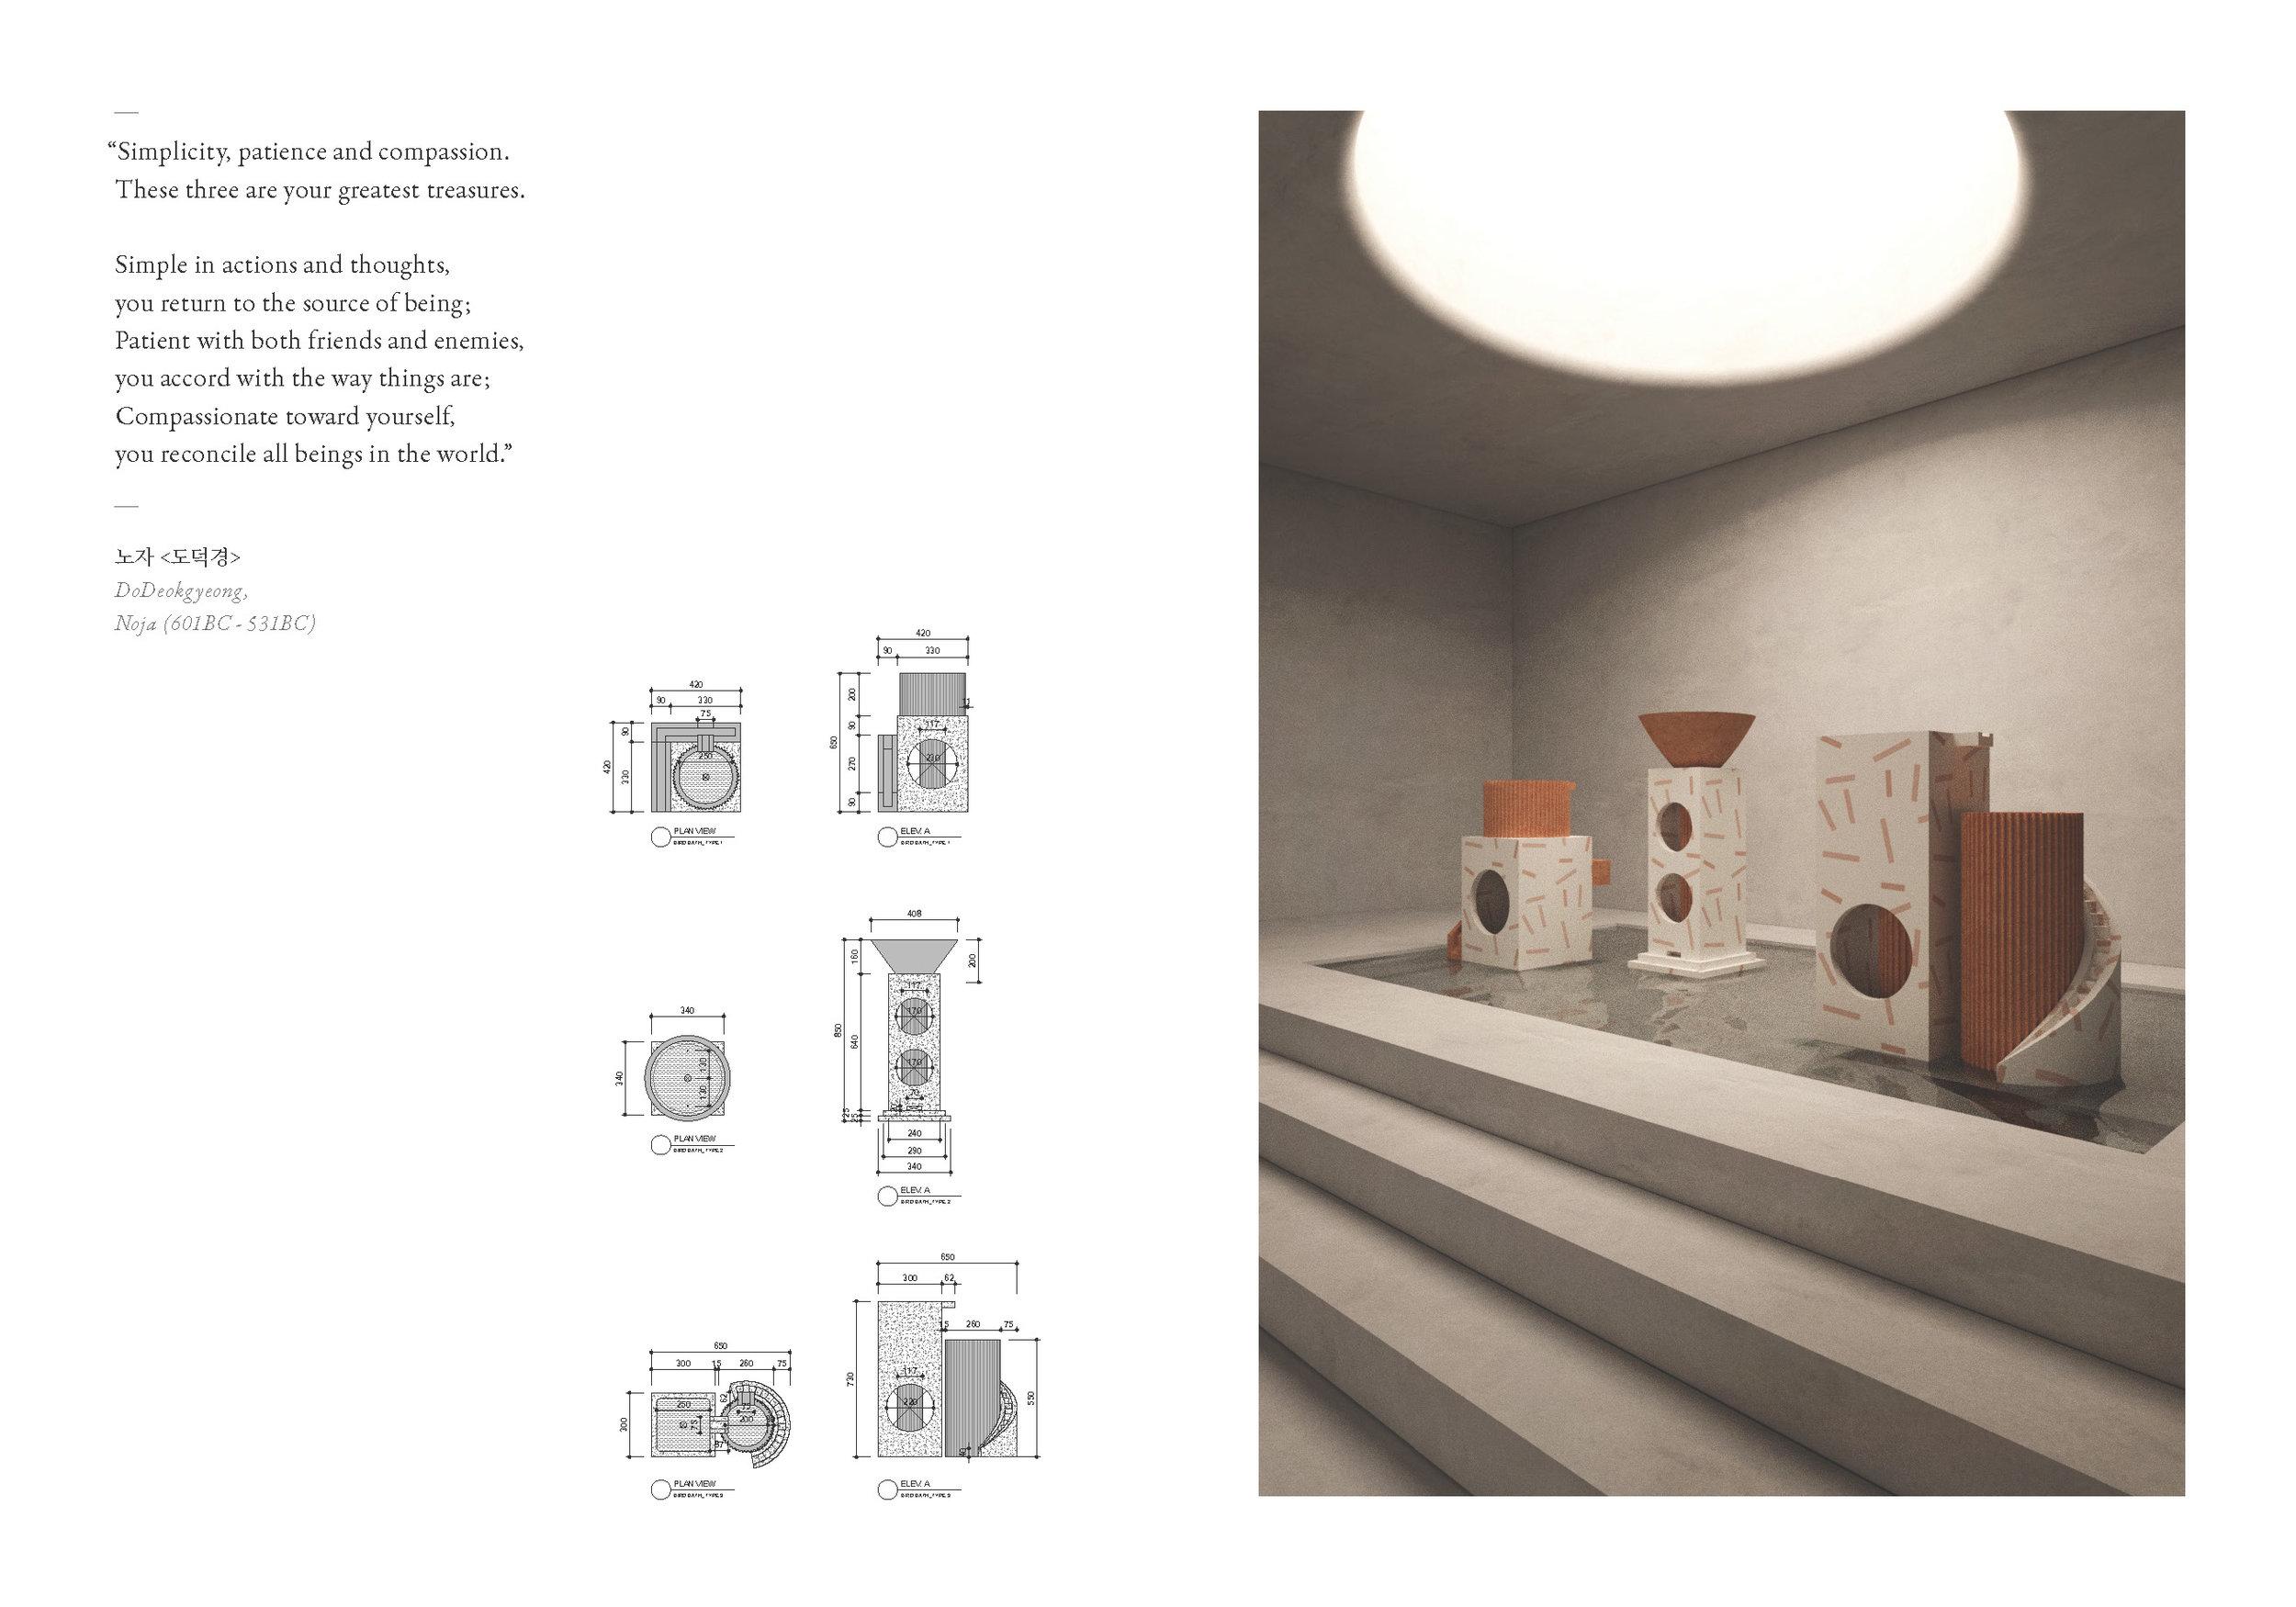 Wallpaper Handmade_Design & Concept_190405_Page_4.jpg